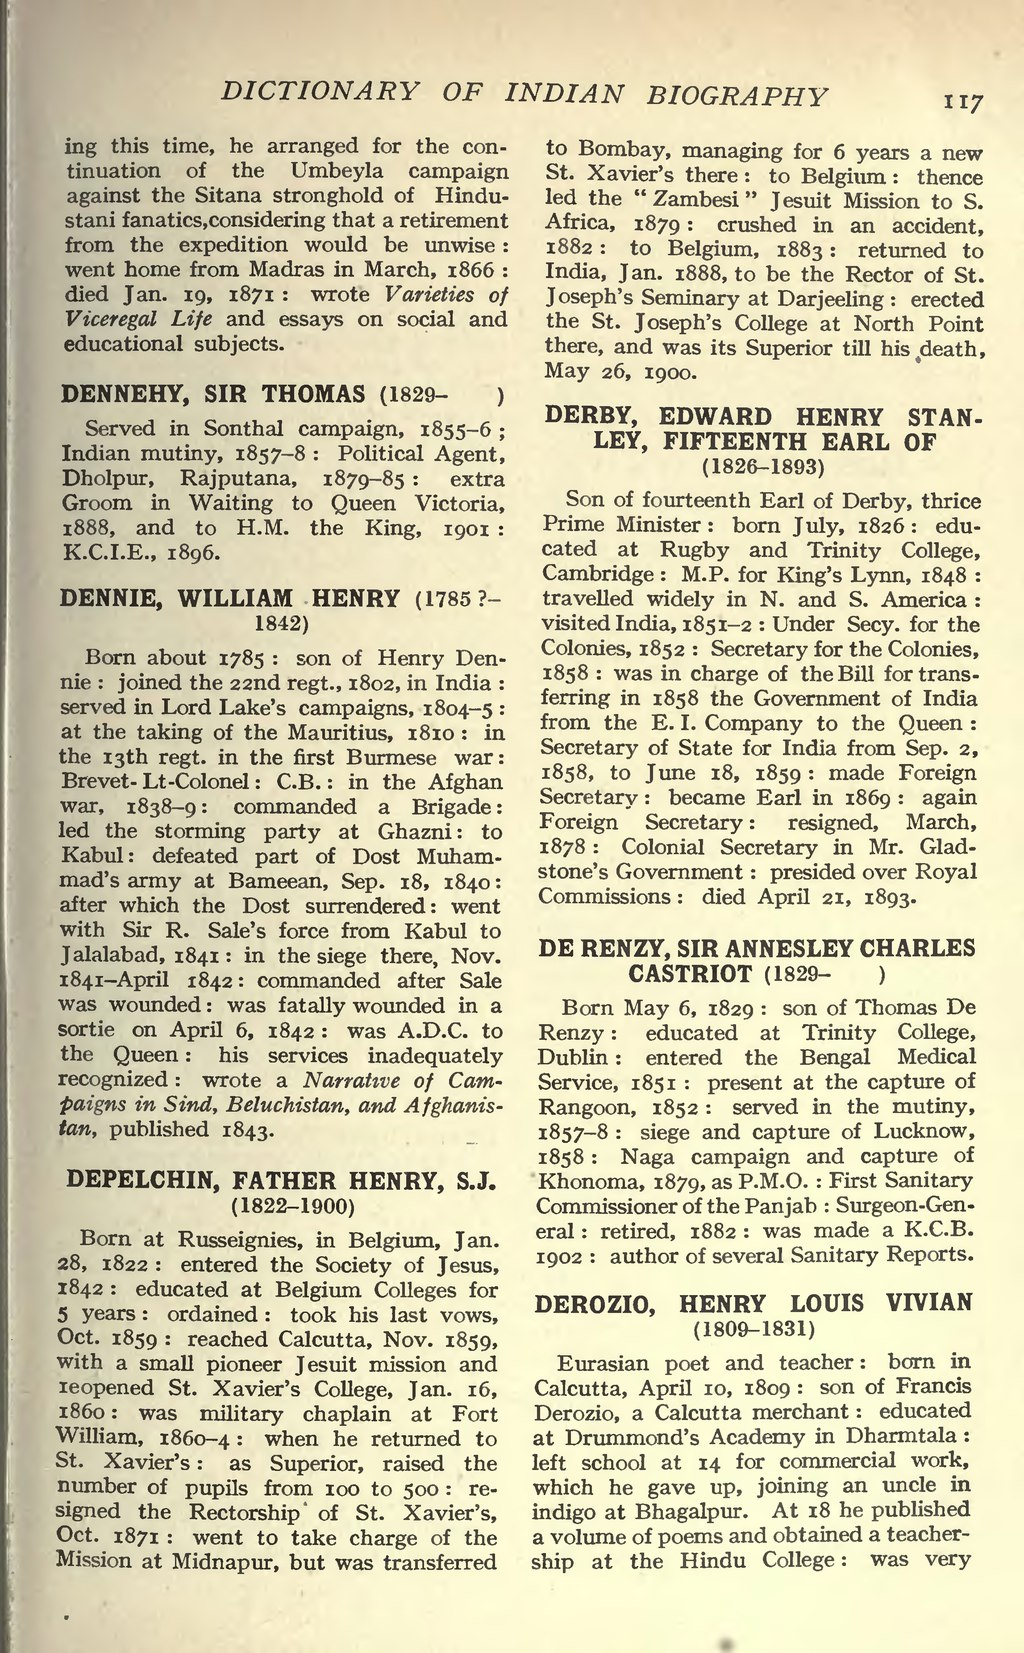 Henry louis vivian derozio pdf viewer